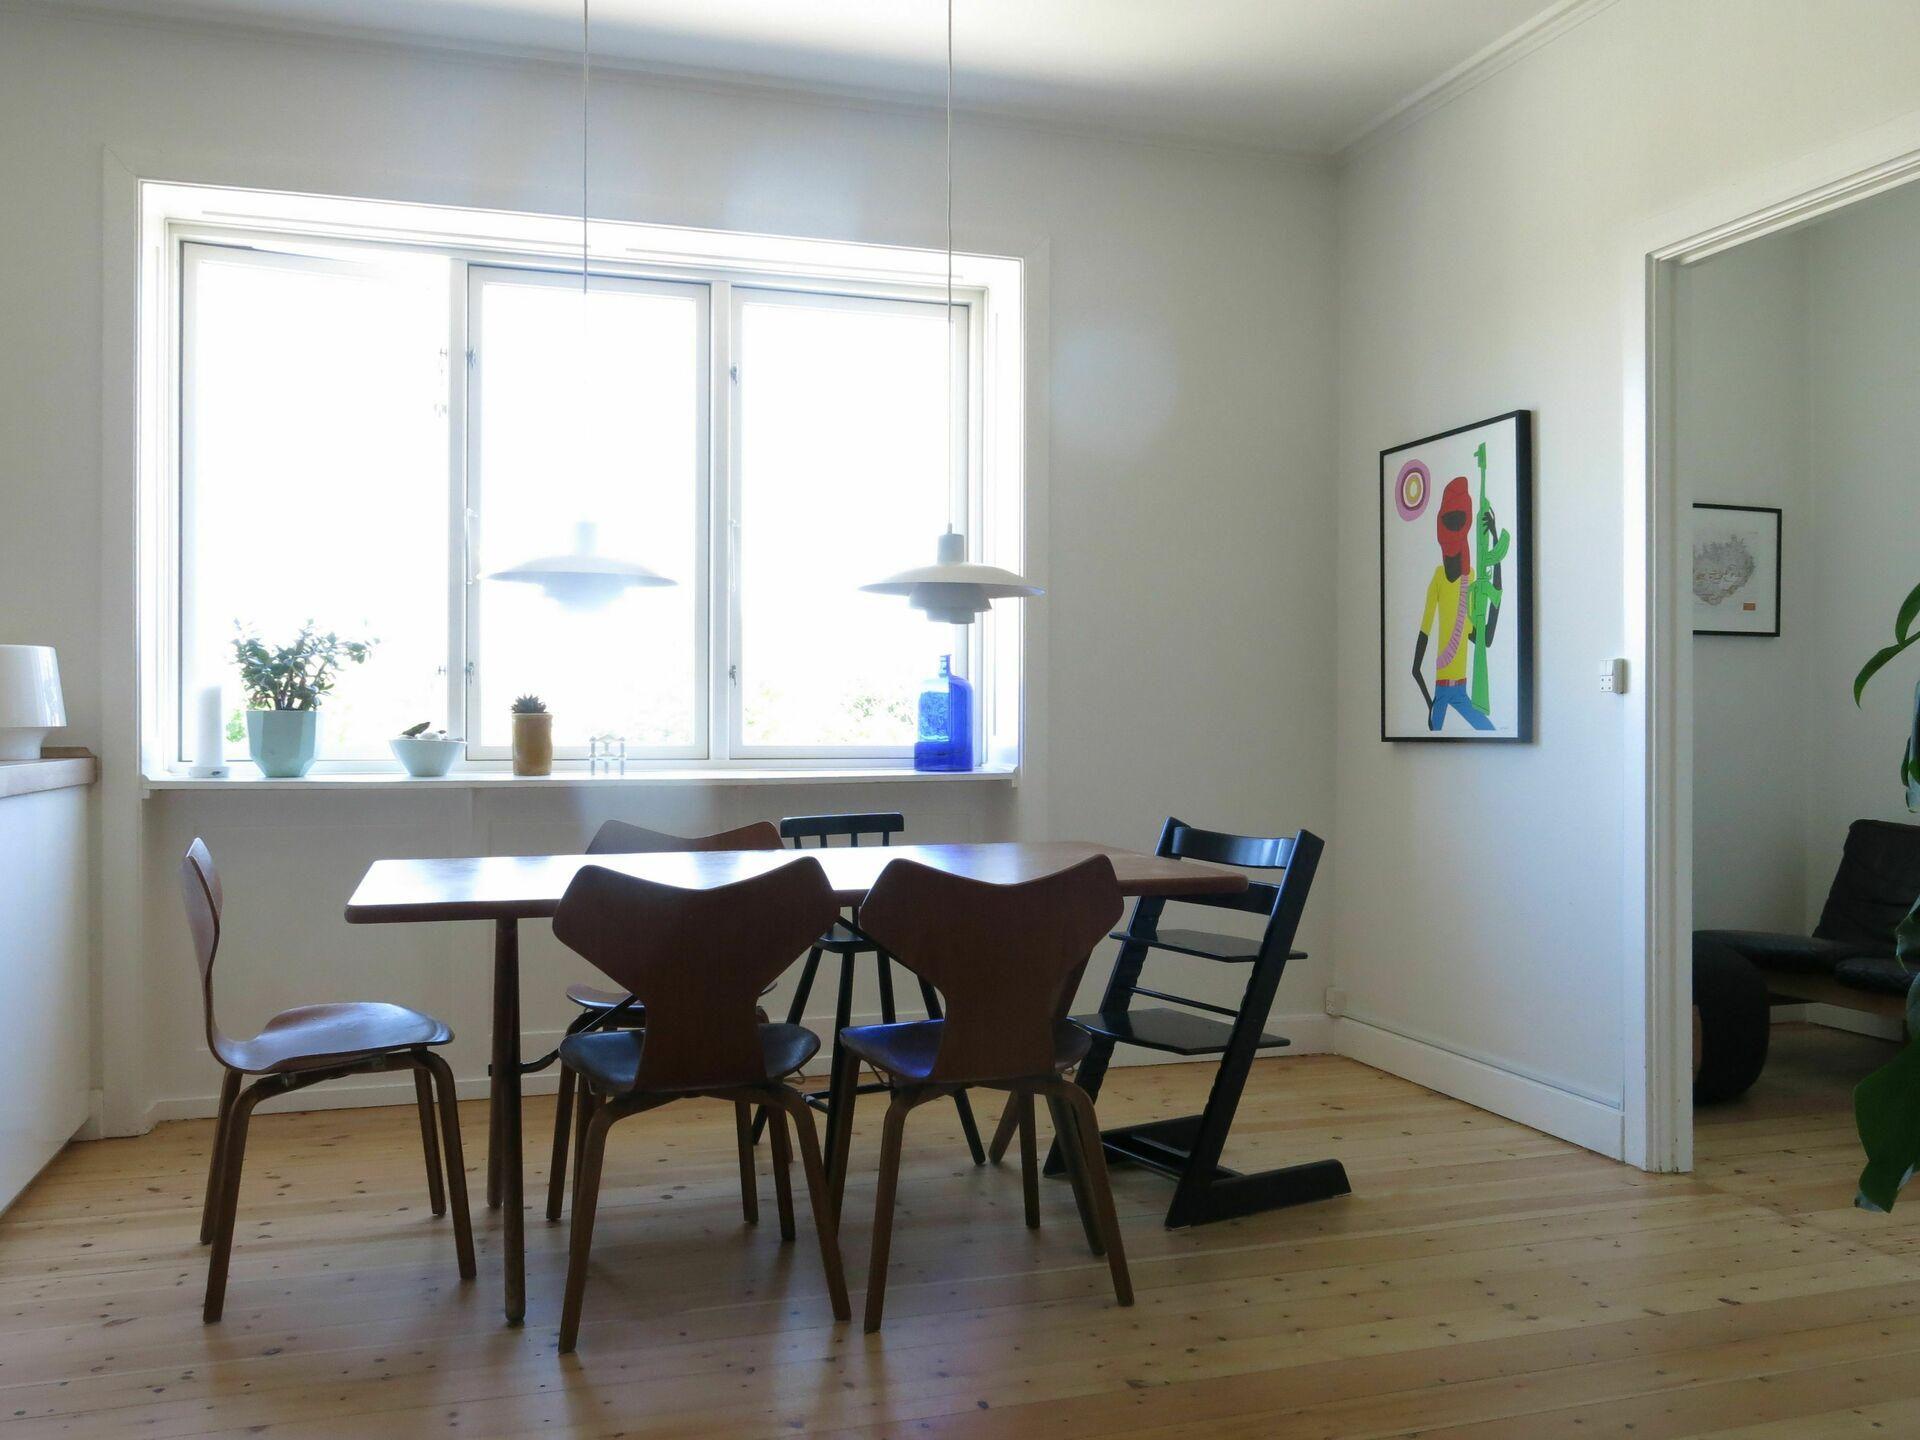 Kopenhagen Wohnung randersgade to transport wohnung in kopenhagen